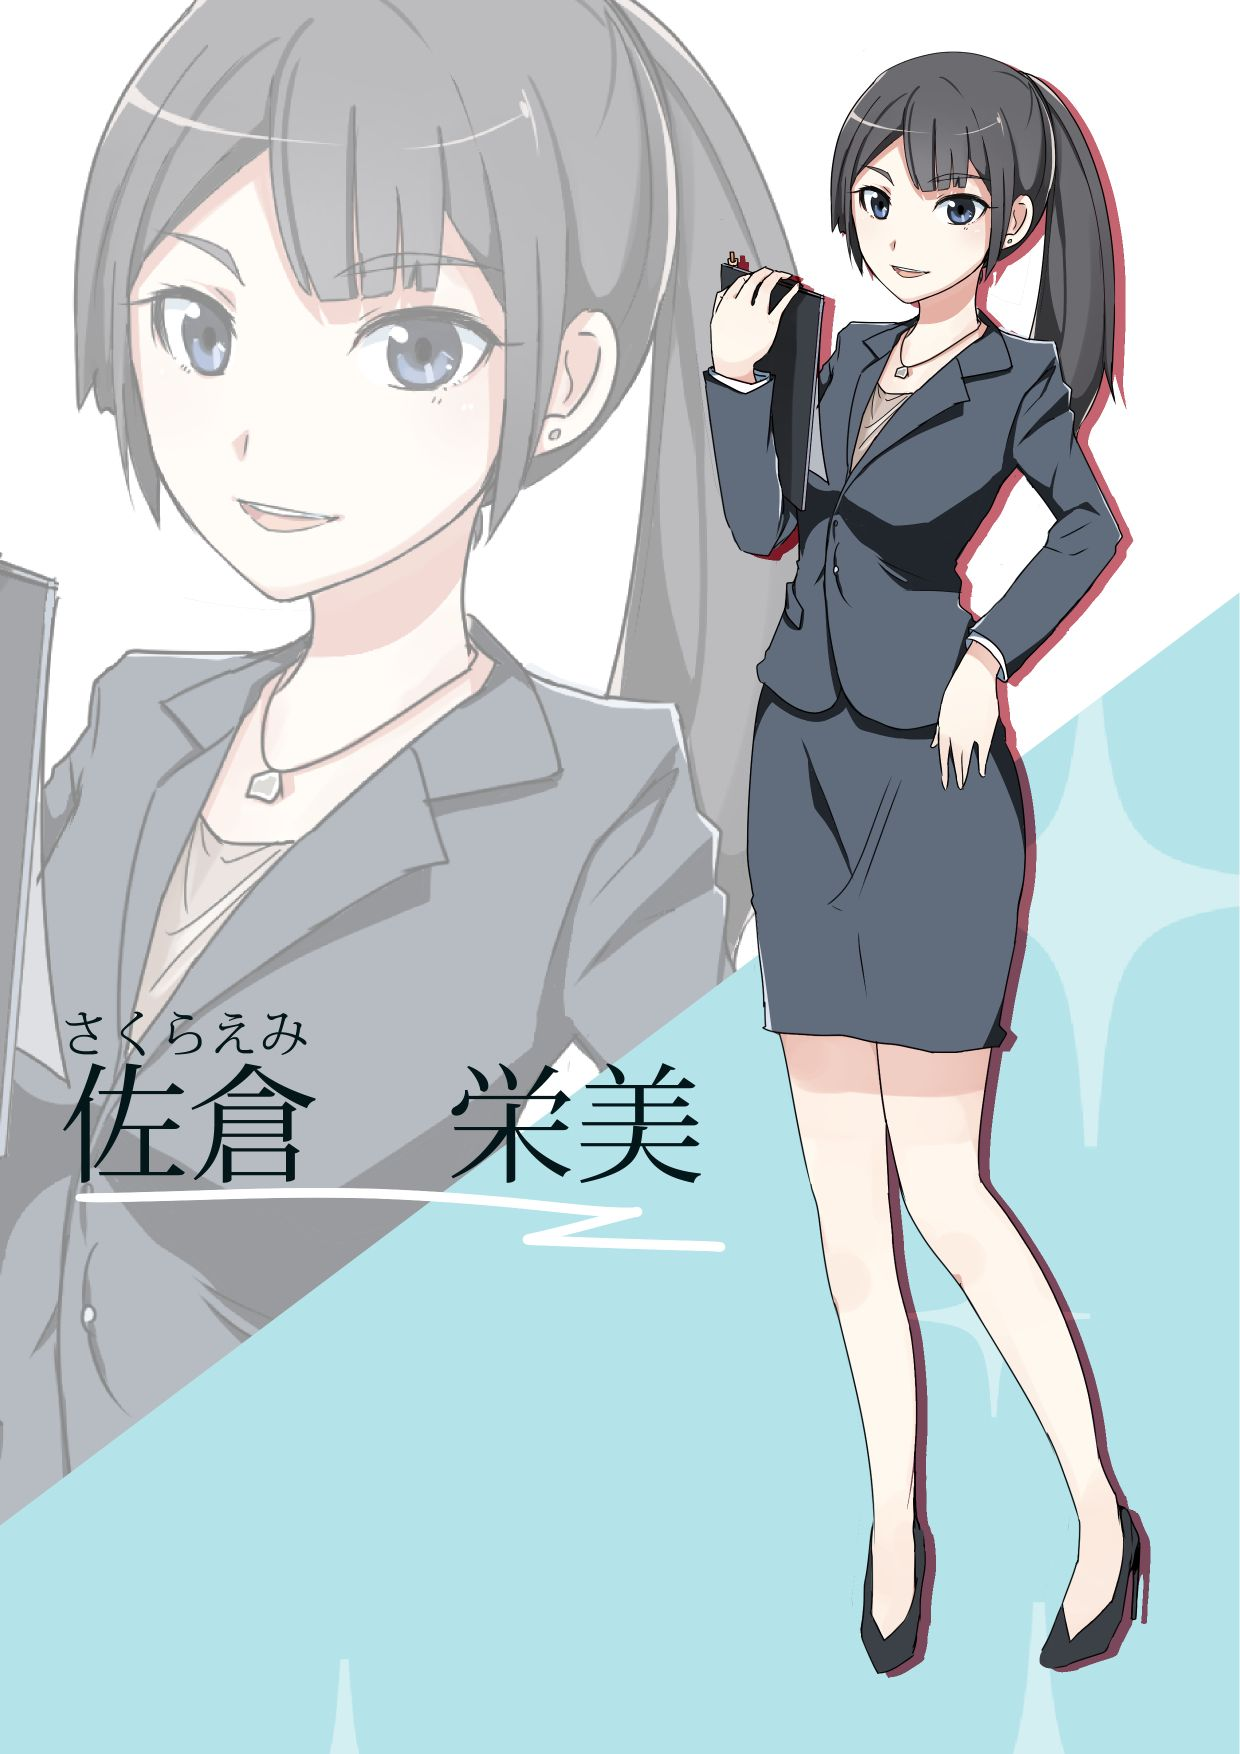 Pin By Kurt Pham On Anime Girls Office Ladies Anime Character Design Character Design Character Art